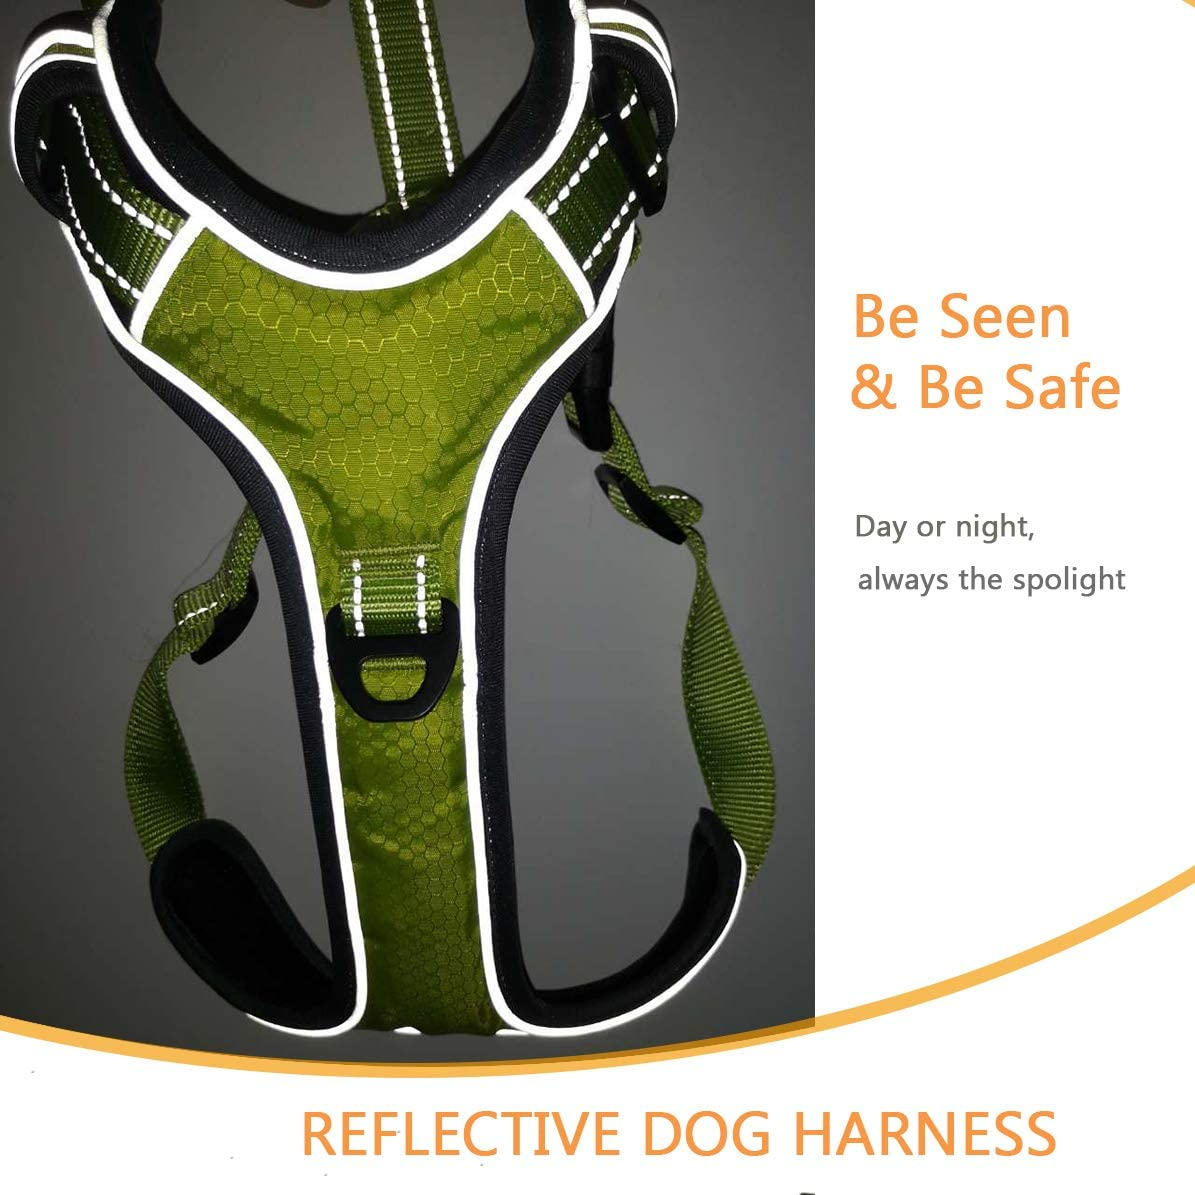 S, Naranja Arn/és Pecho Antitirones Ajustable,Arn/és Reflectante para Exteriores de 3M Sin tir/ón para Acampar Senderismo Visibilidad Nocturna PETTOM Arn/és para Perros Caminar